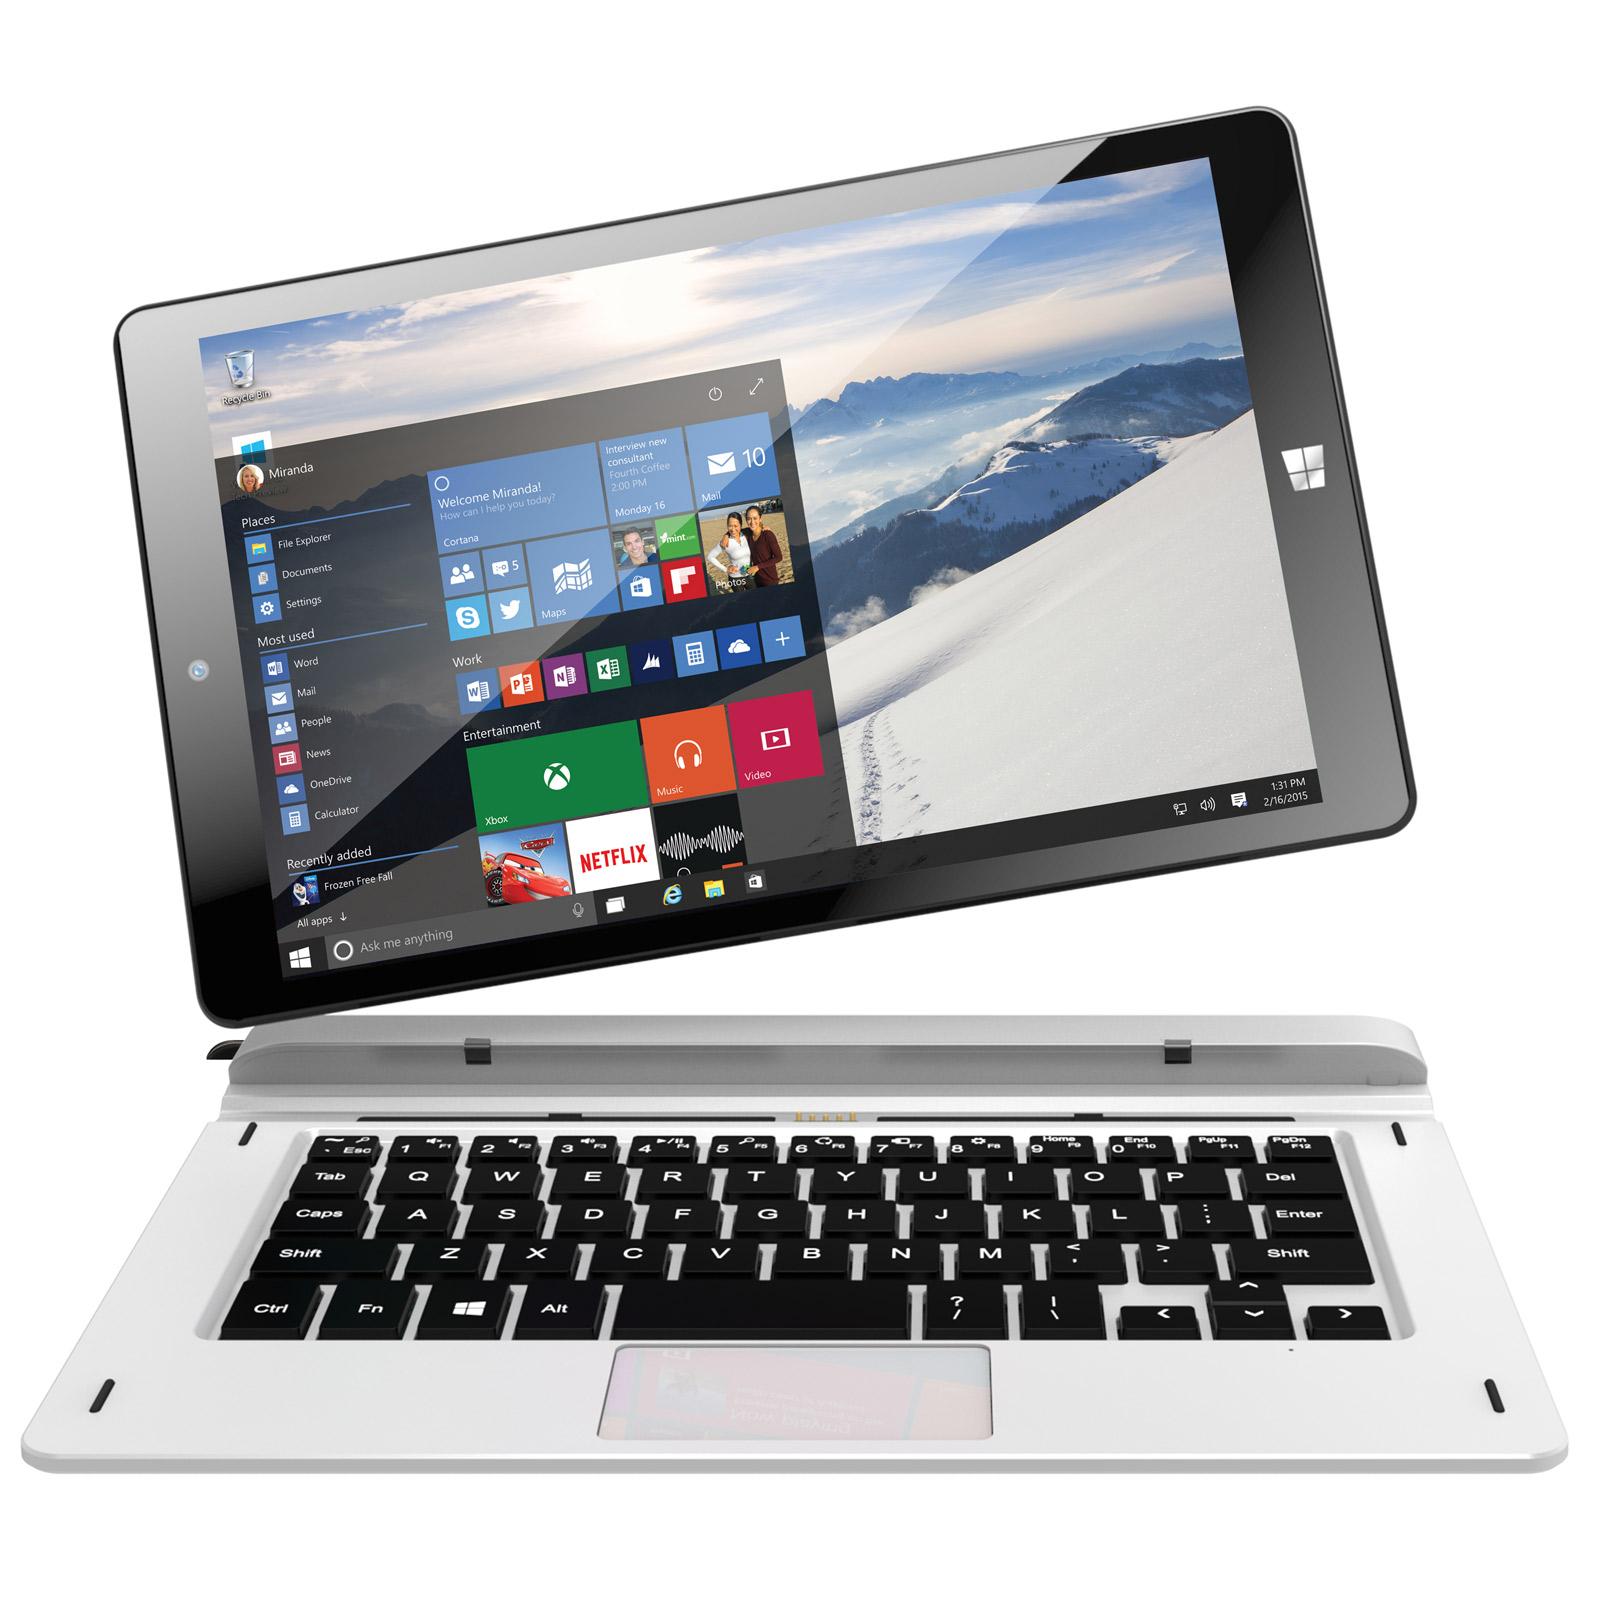 41f43146d50ecf Thomson Prestige THBK1-9.32WIN Tablette Internet - Intel Atom Z3735G 1 Go  eMMC 32 Go 8.9